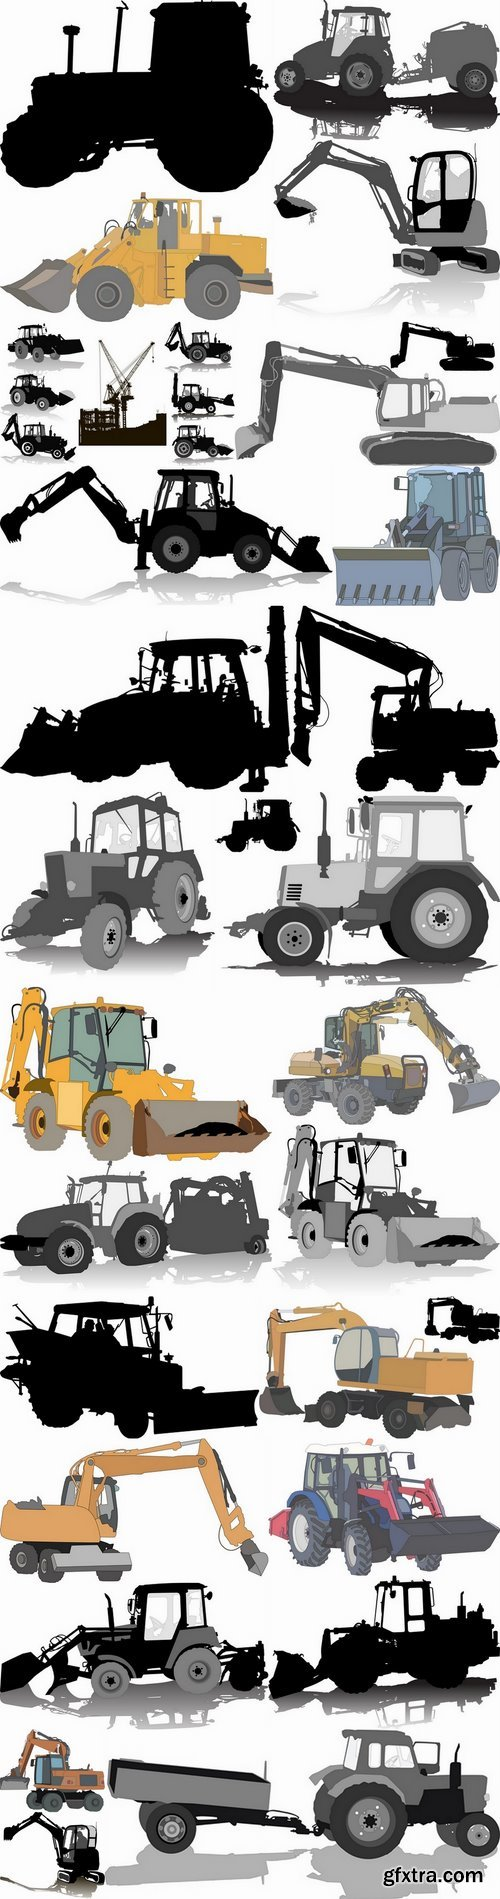 Tractor excavator bulldozer construction equipment 25 EPS